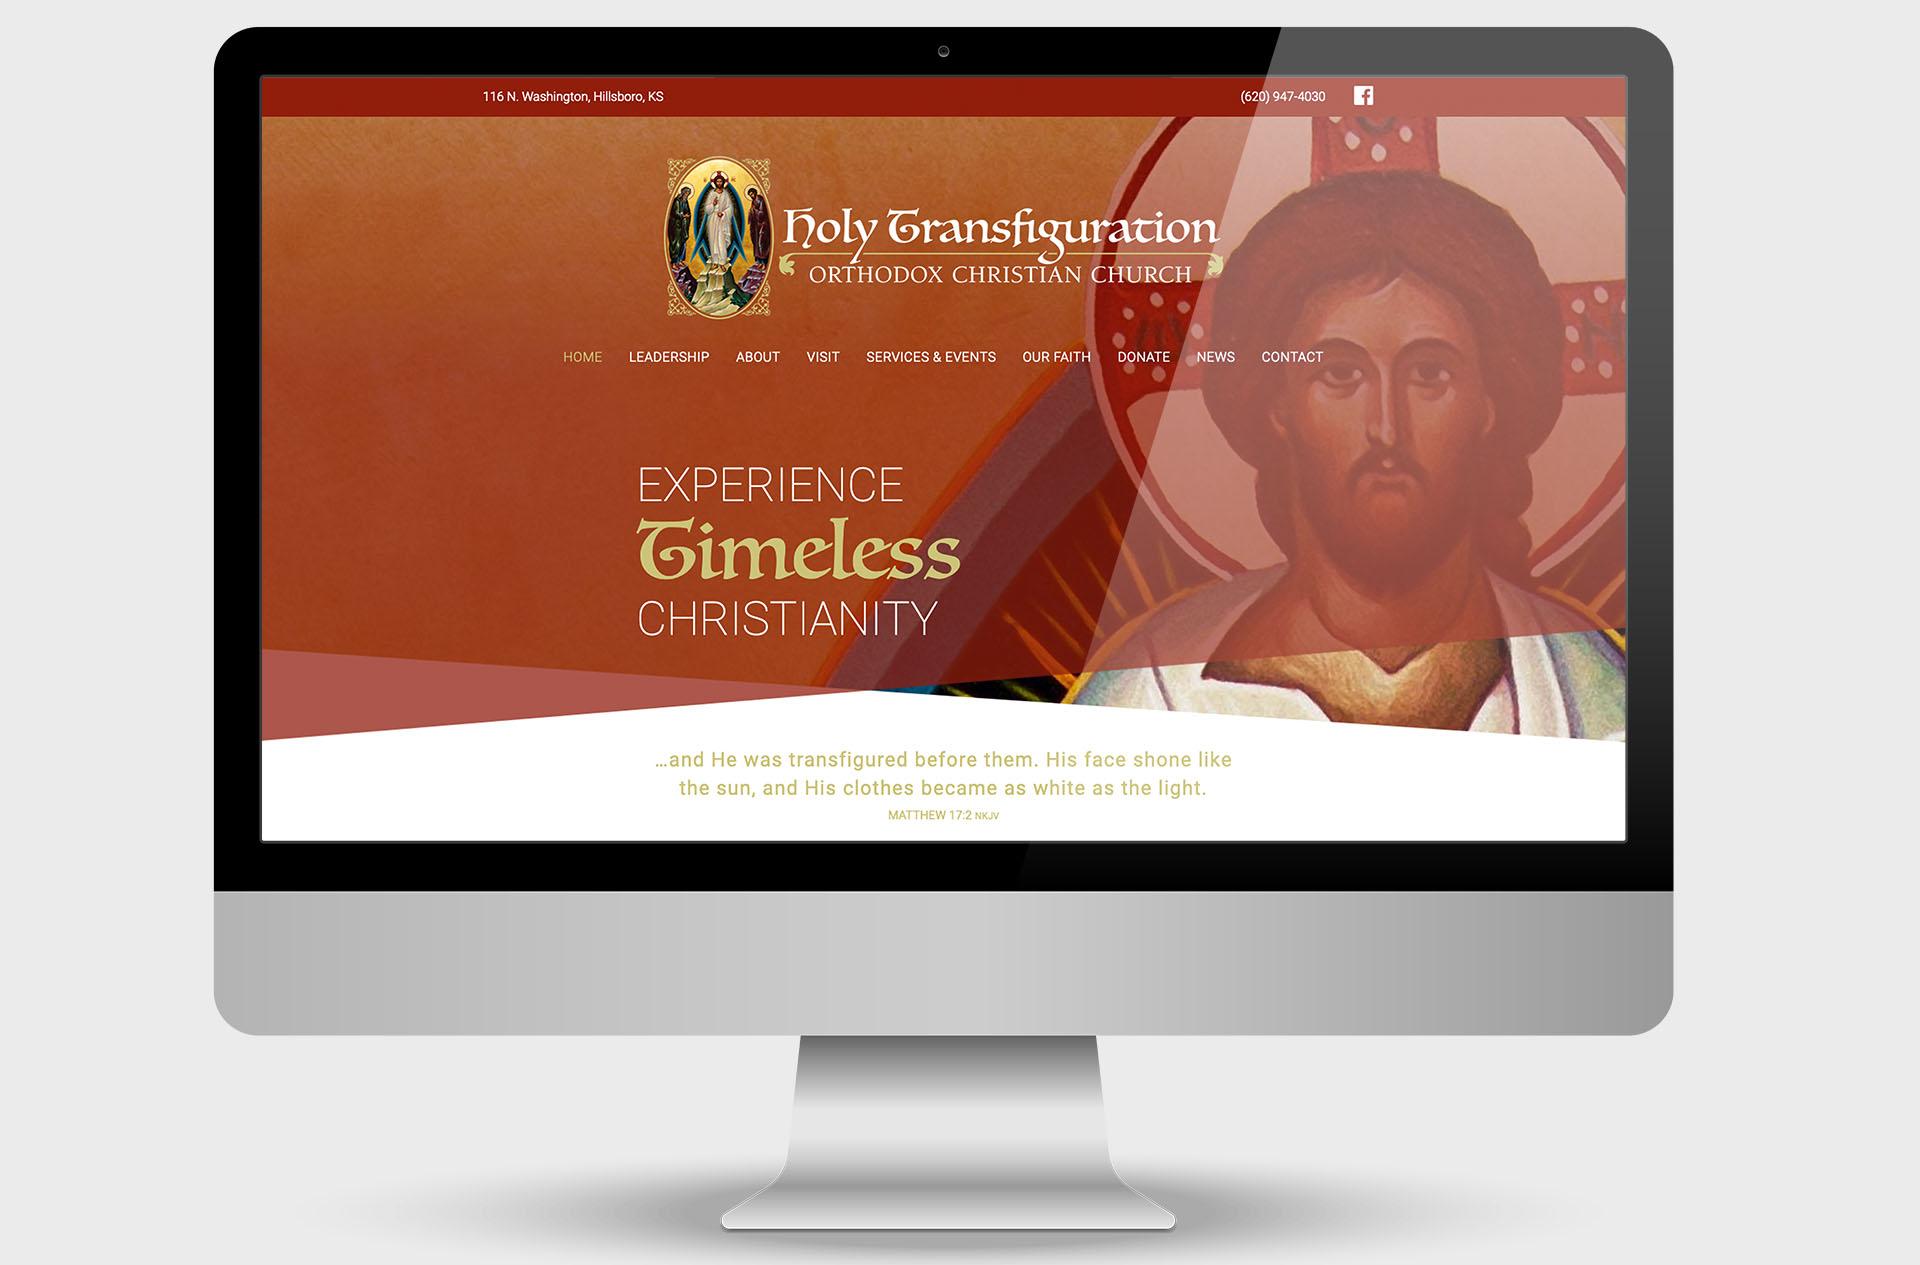 Holy Transfiguration Orthodox Christian ChurchCustom Website Design